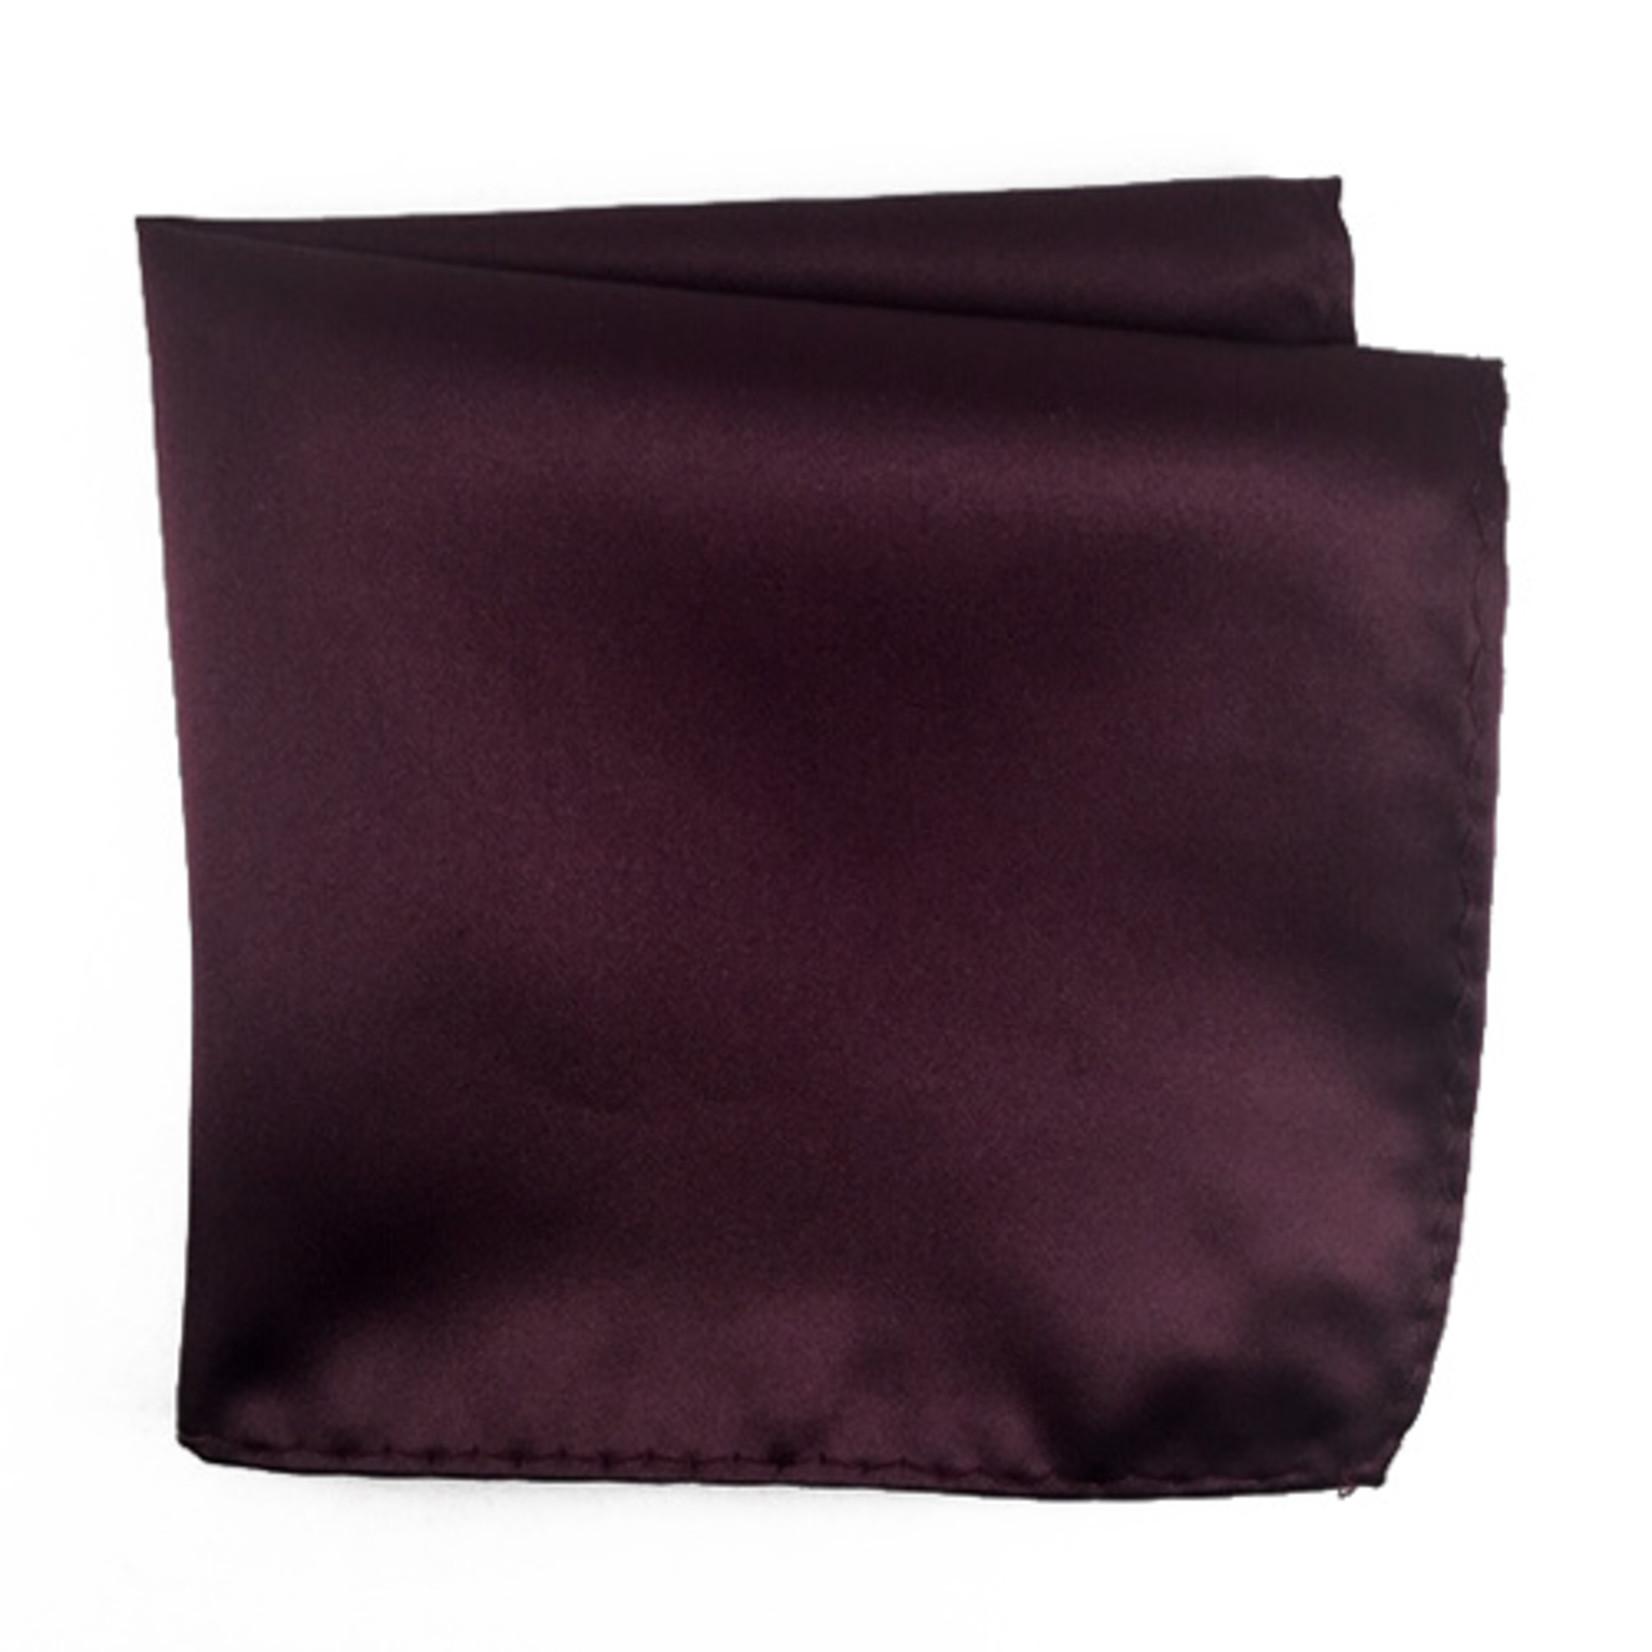 Knotz M100PSQ-3 Solid Wine Pocket Square